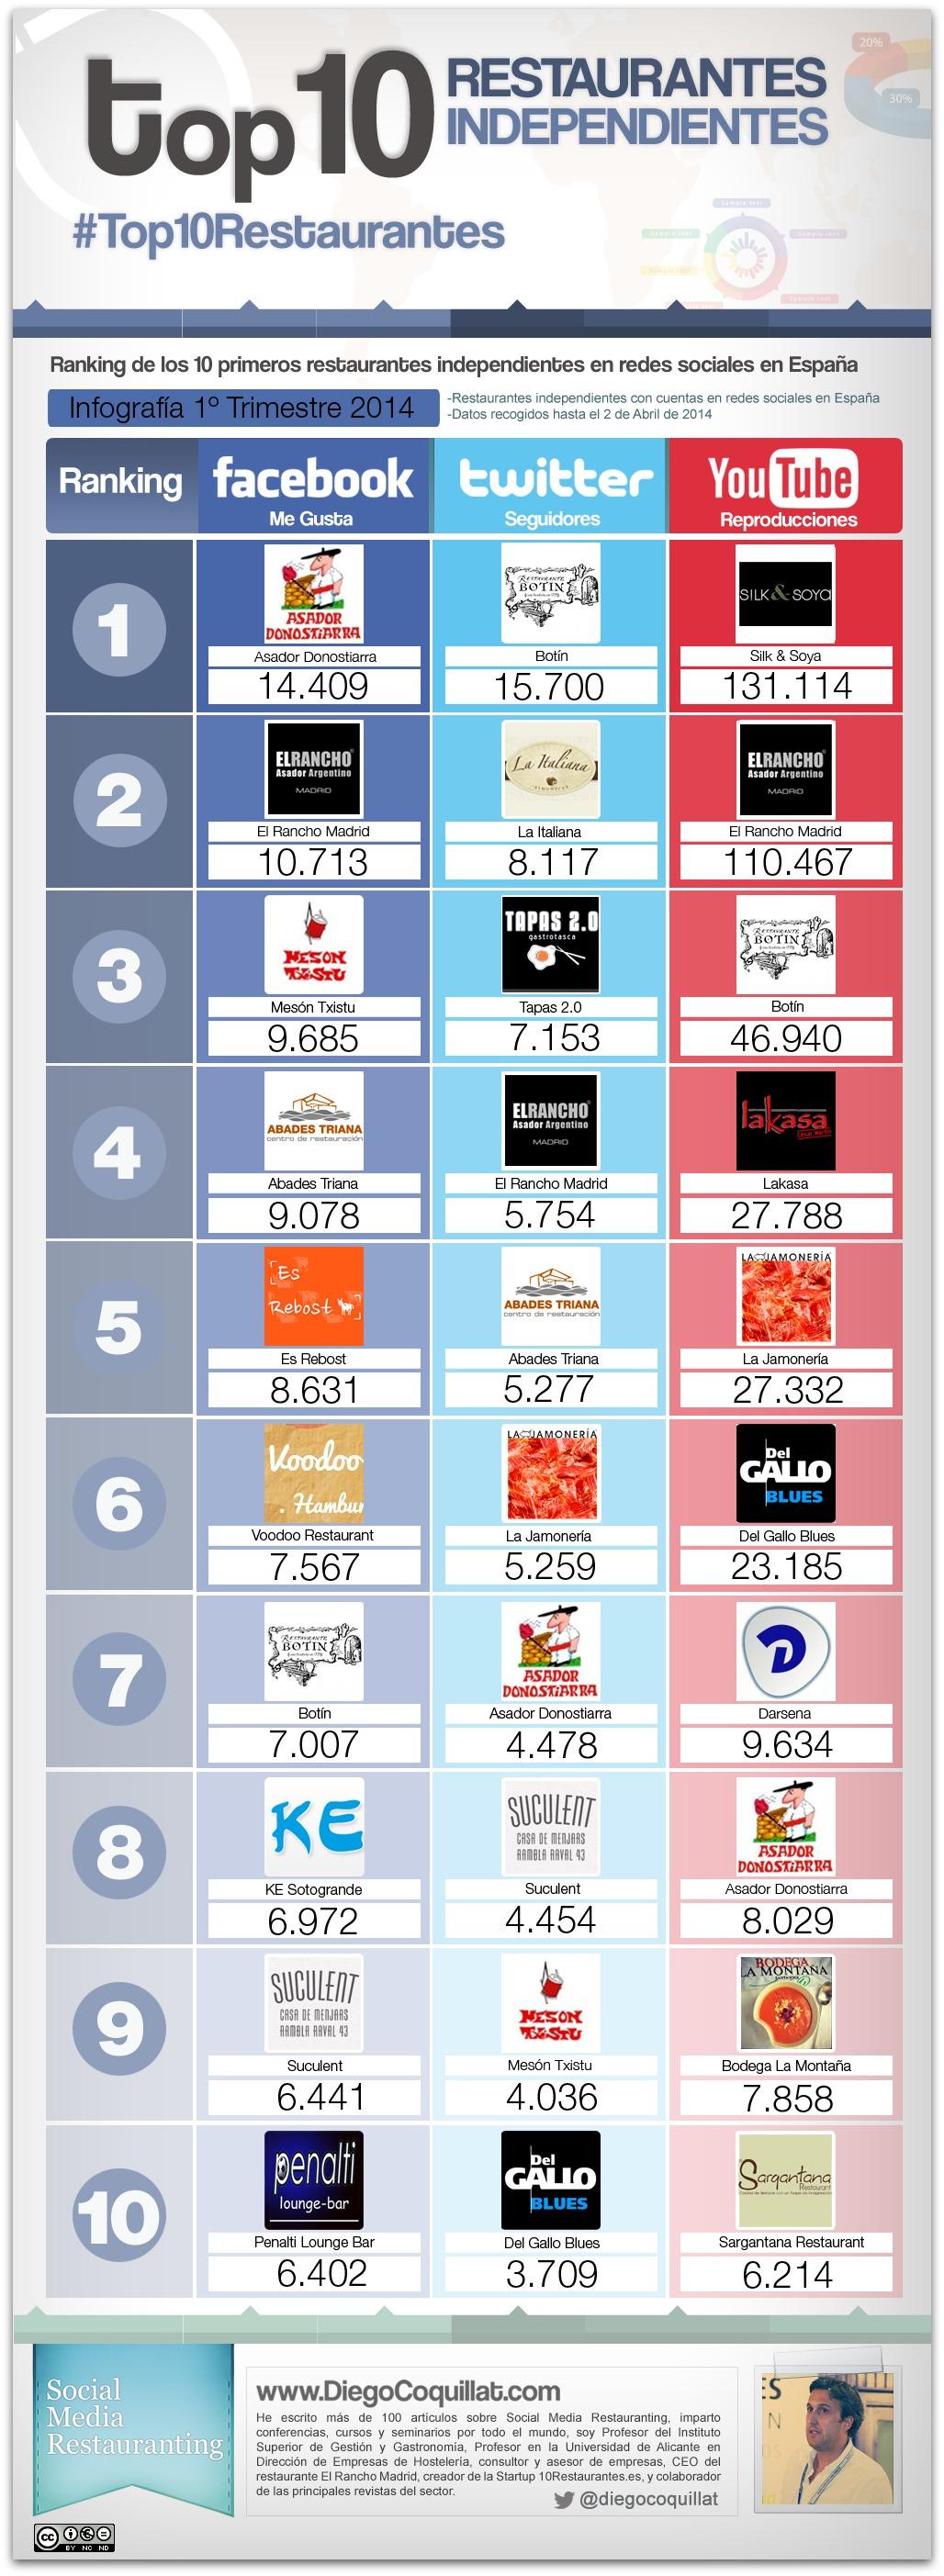 Best independent restaurants in social networks in Spain